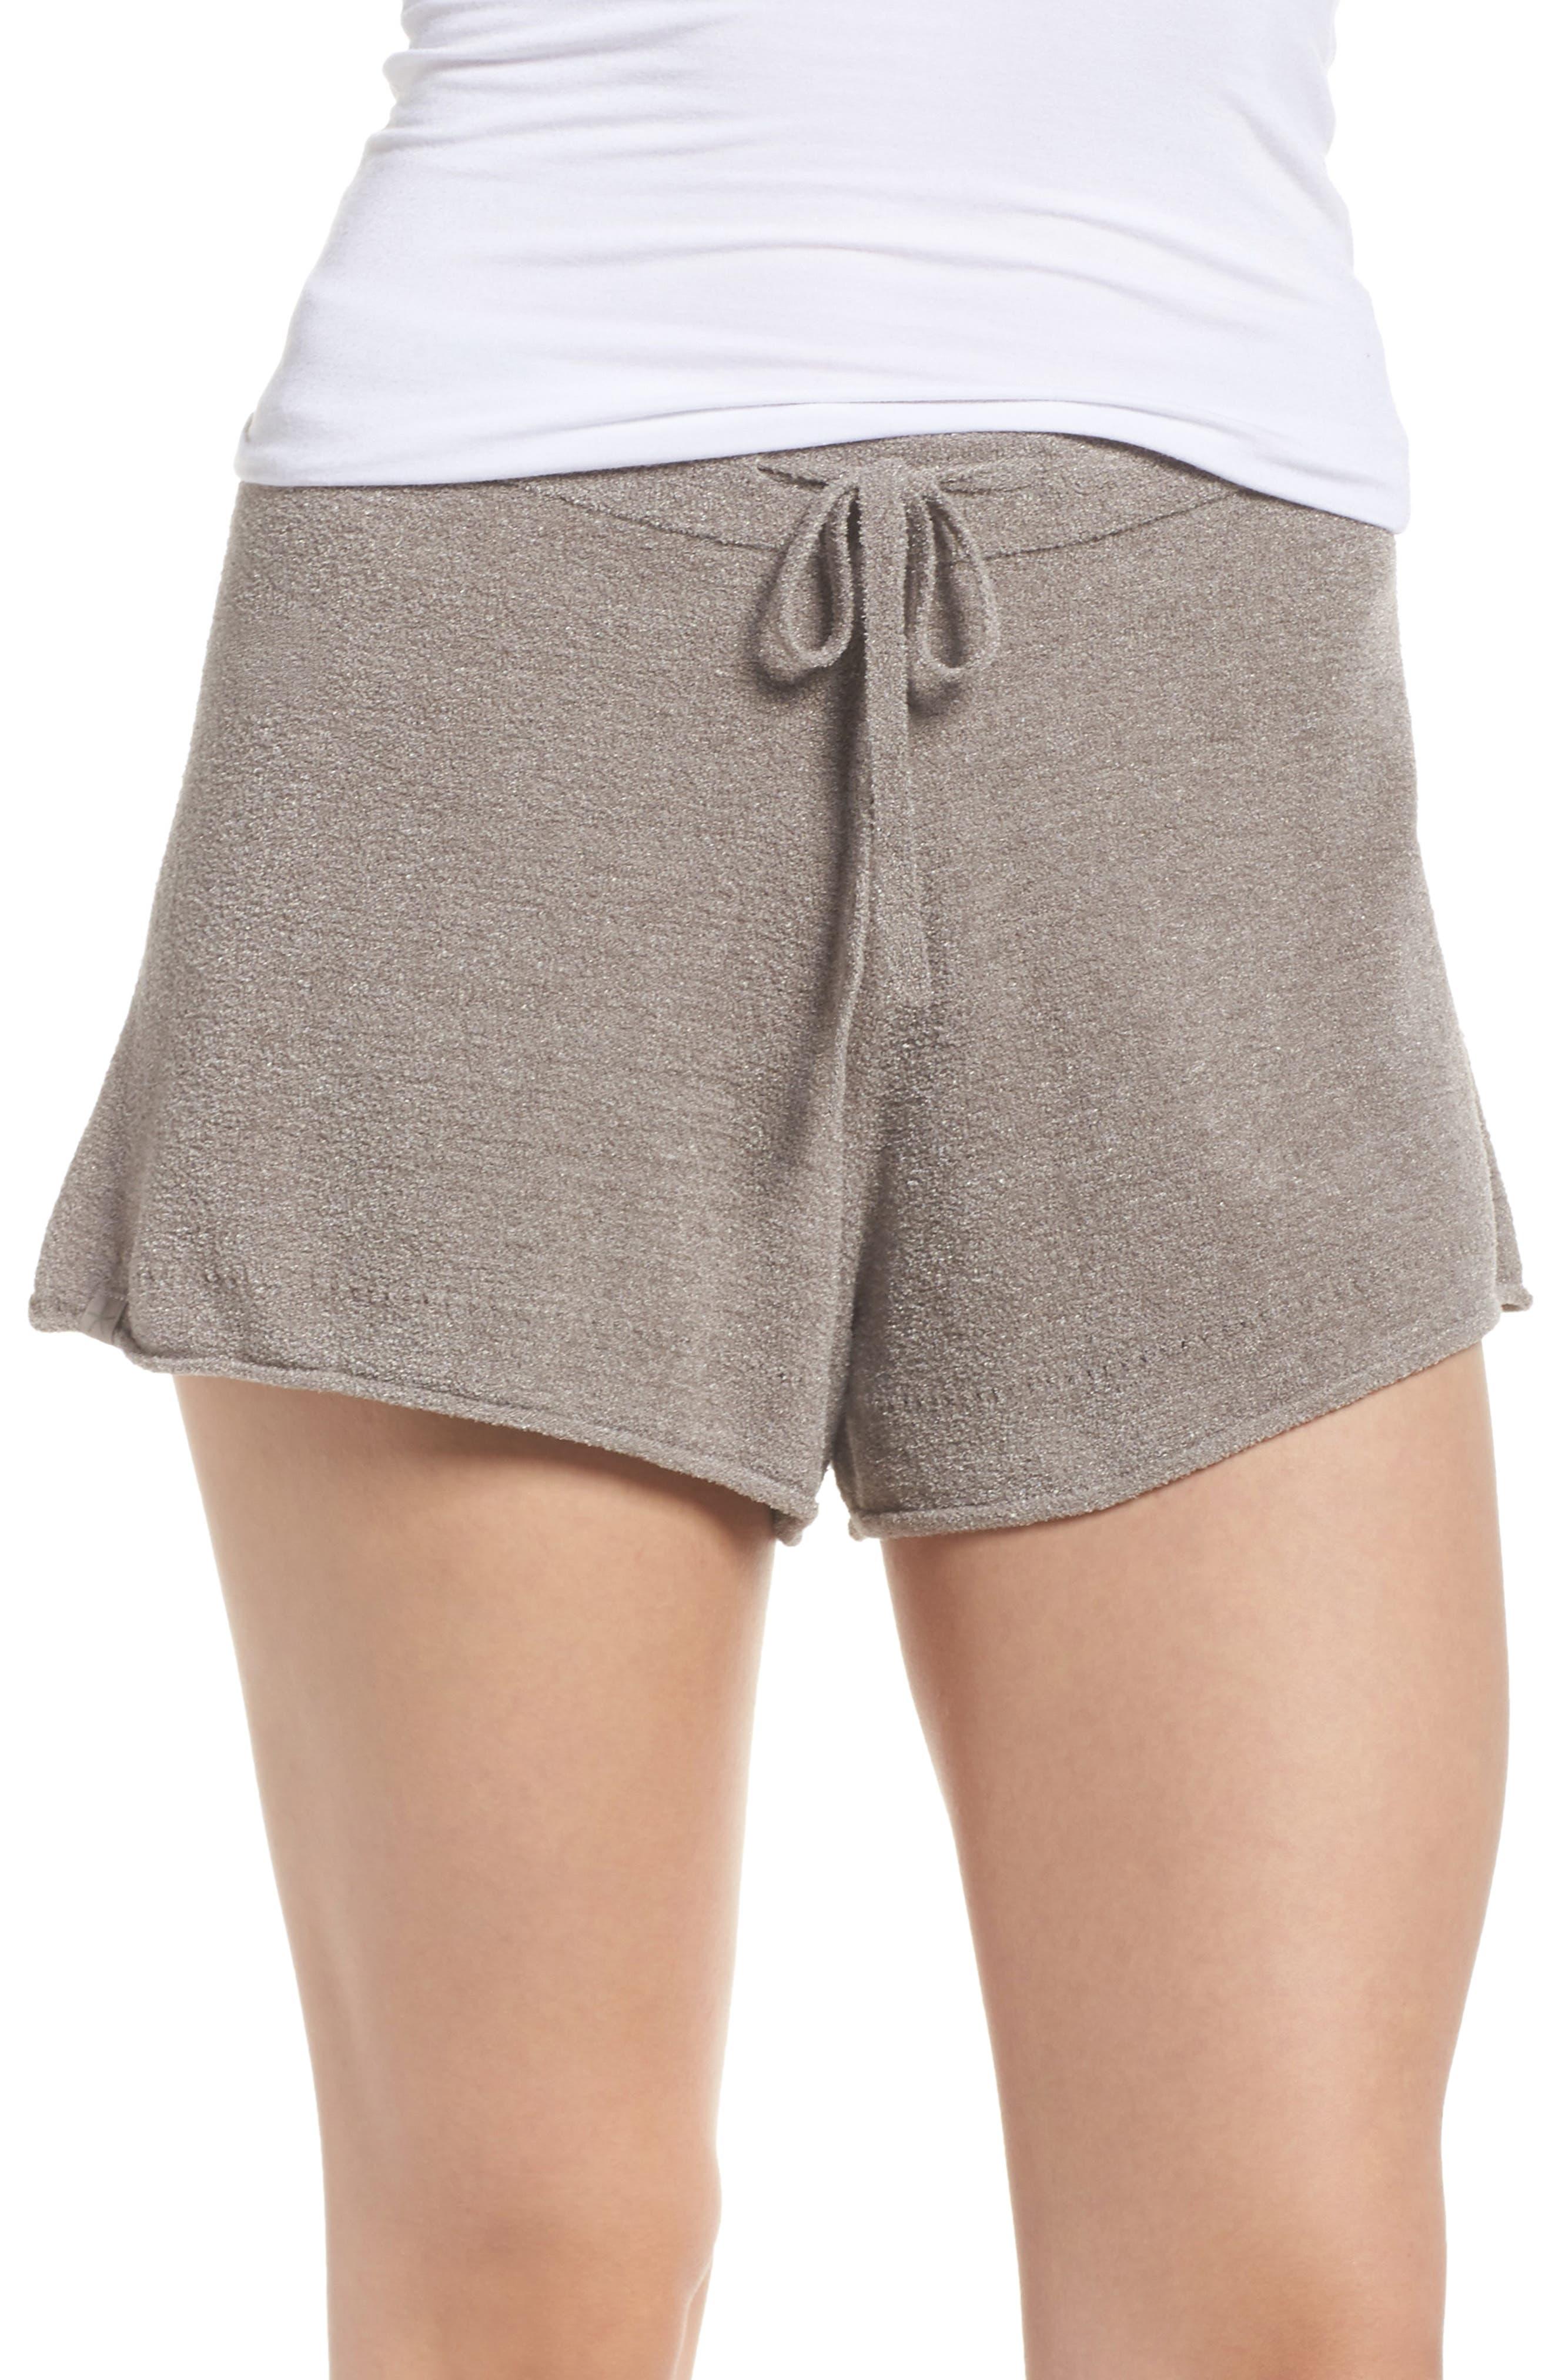 CozyChic Ultra Lite<sup>®</sup> Lounge Shorts,                         Main,                         color, Beach Rock